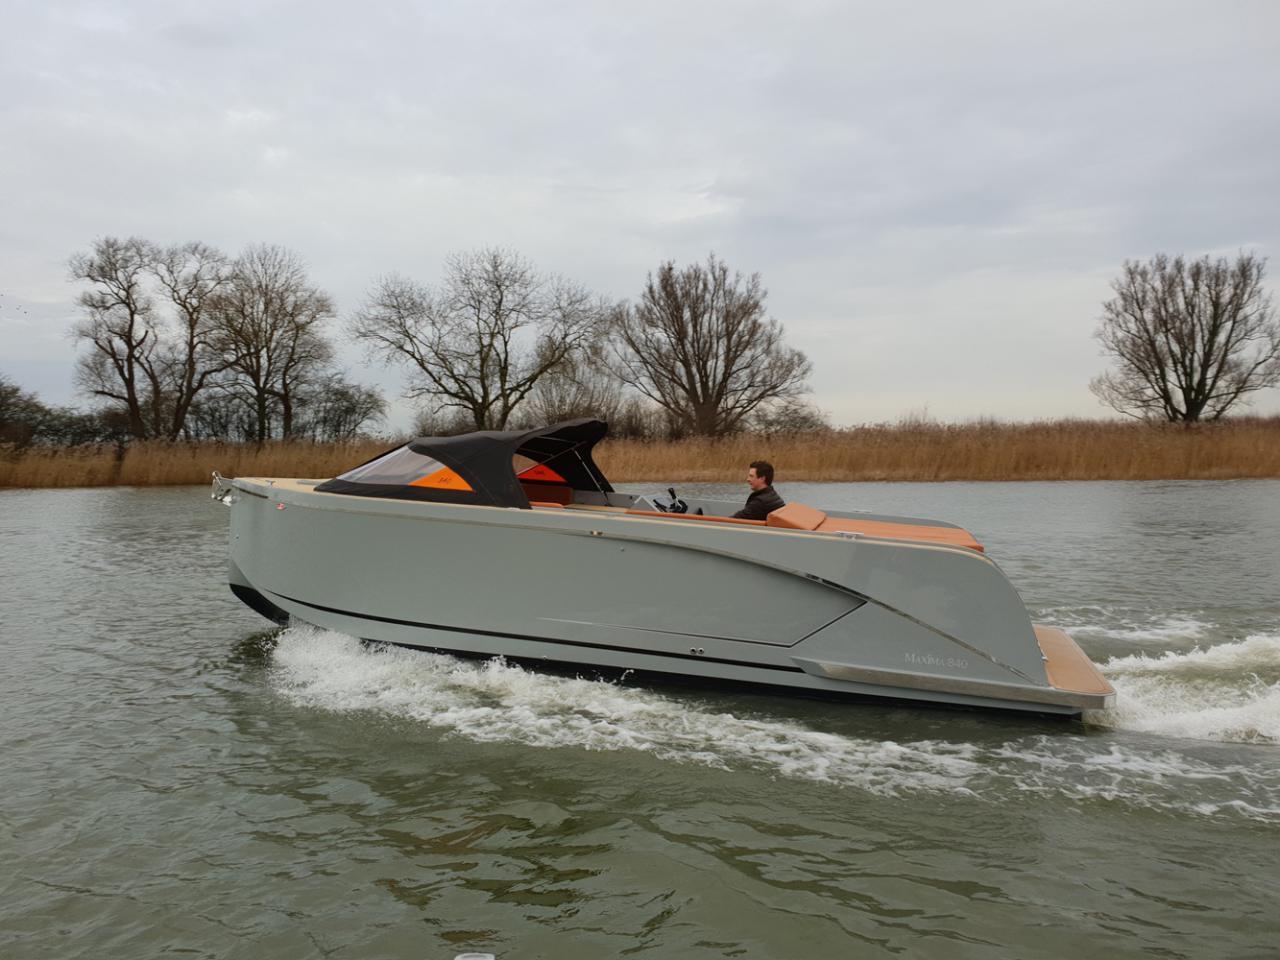 Maxima 840 tender 30